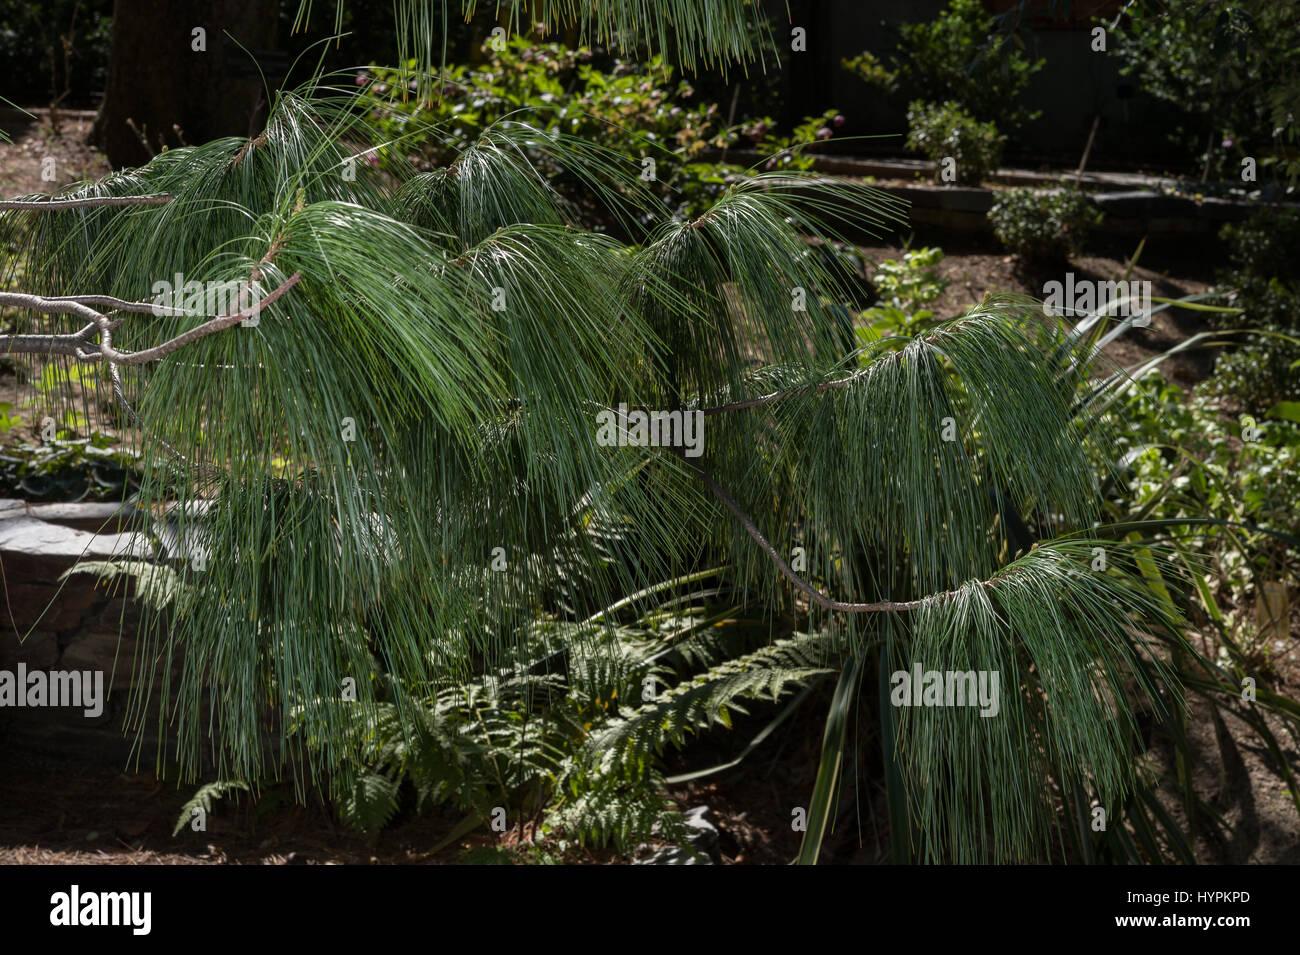 Bhutan pine, Pinus wallichiana, Pinaceae, Bhoutan, Himalaya, Asie Photo Stock